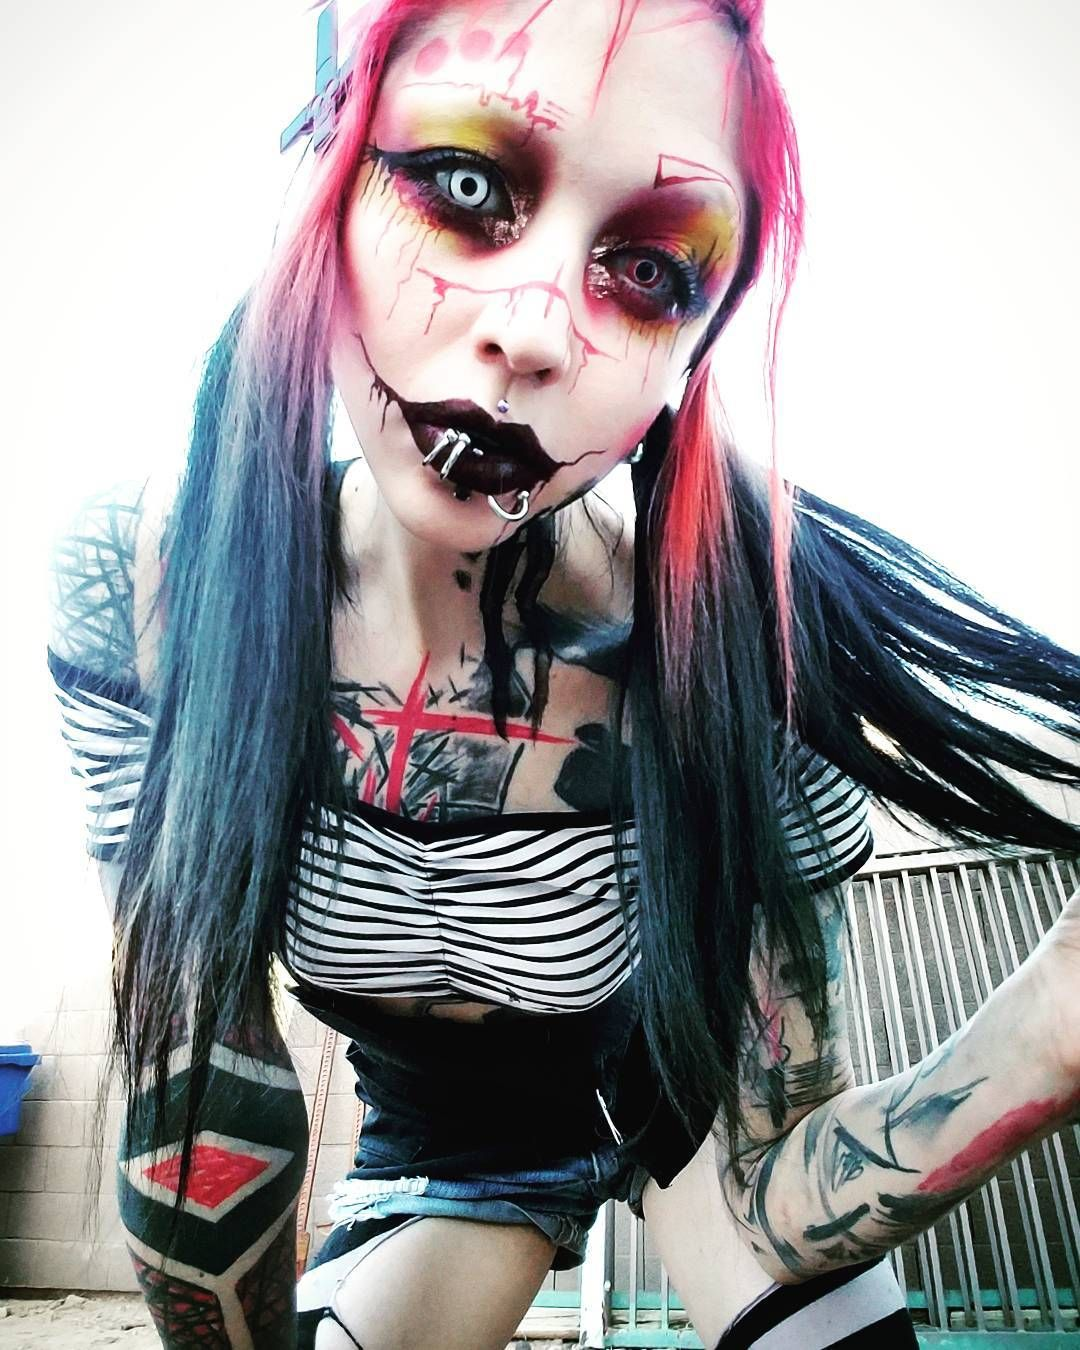 6 028 Otmetok Nravitsya 113 Kommentariev Rottenmorgue V Instagram Gonna Go Ride Muh Bike N Scare Sum Kids Metal Girl Scene Girls Girl Tattoos